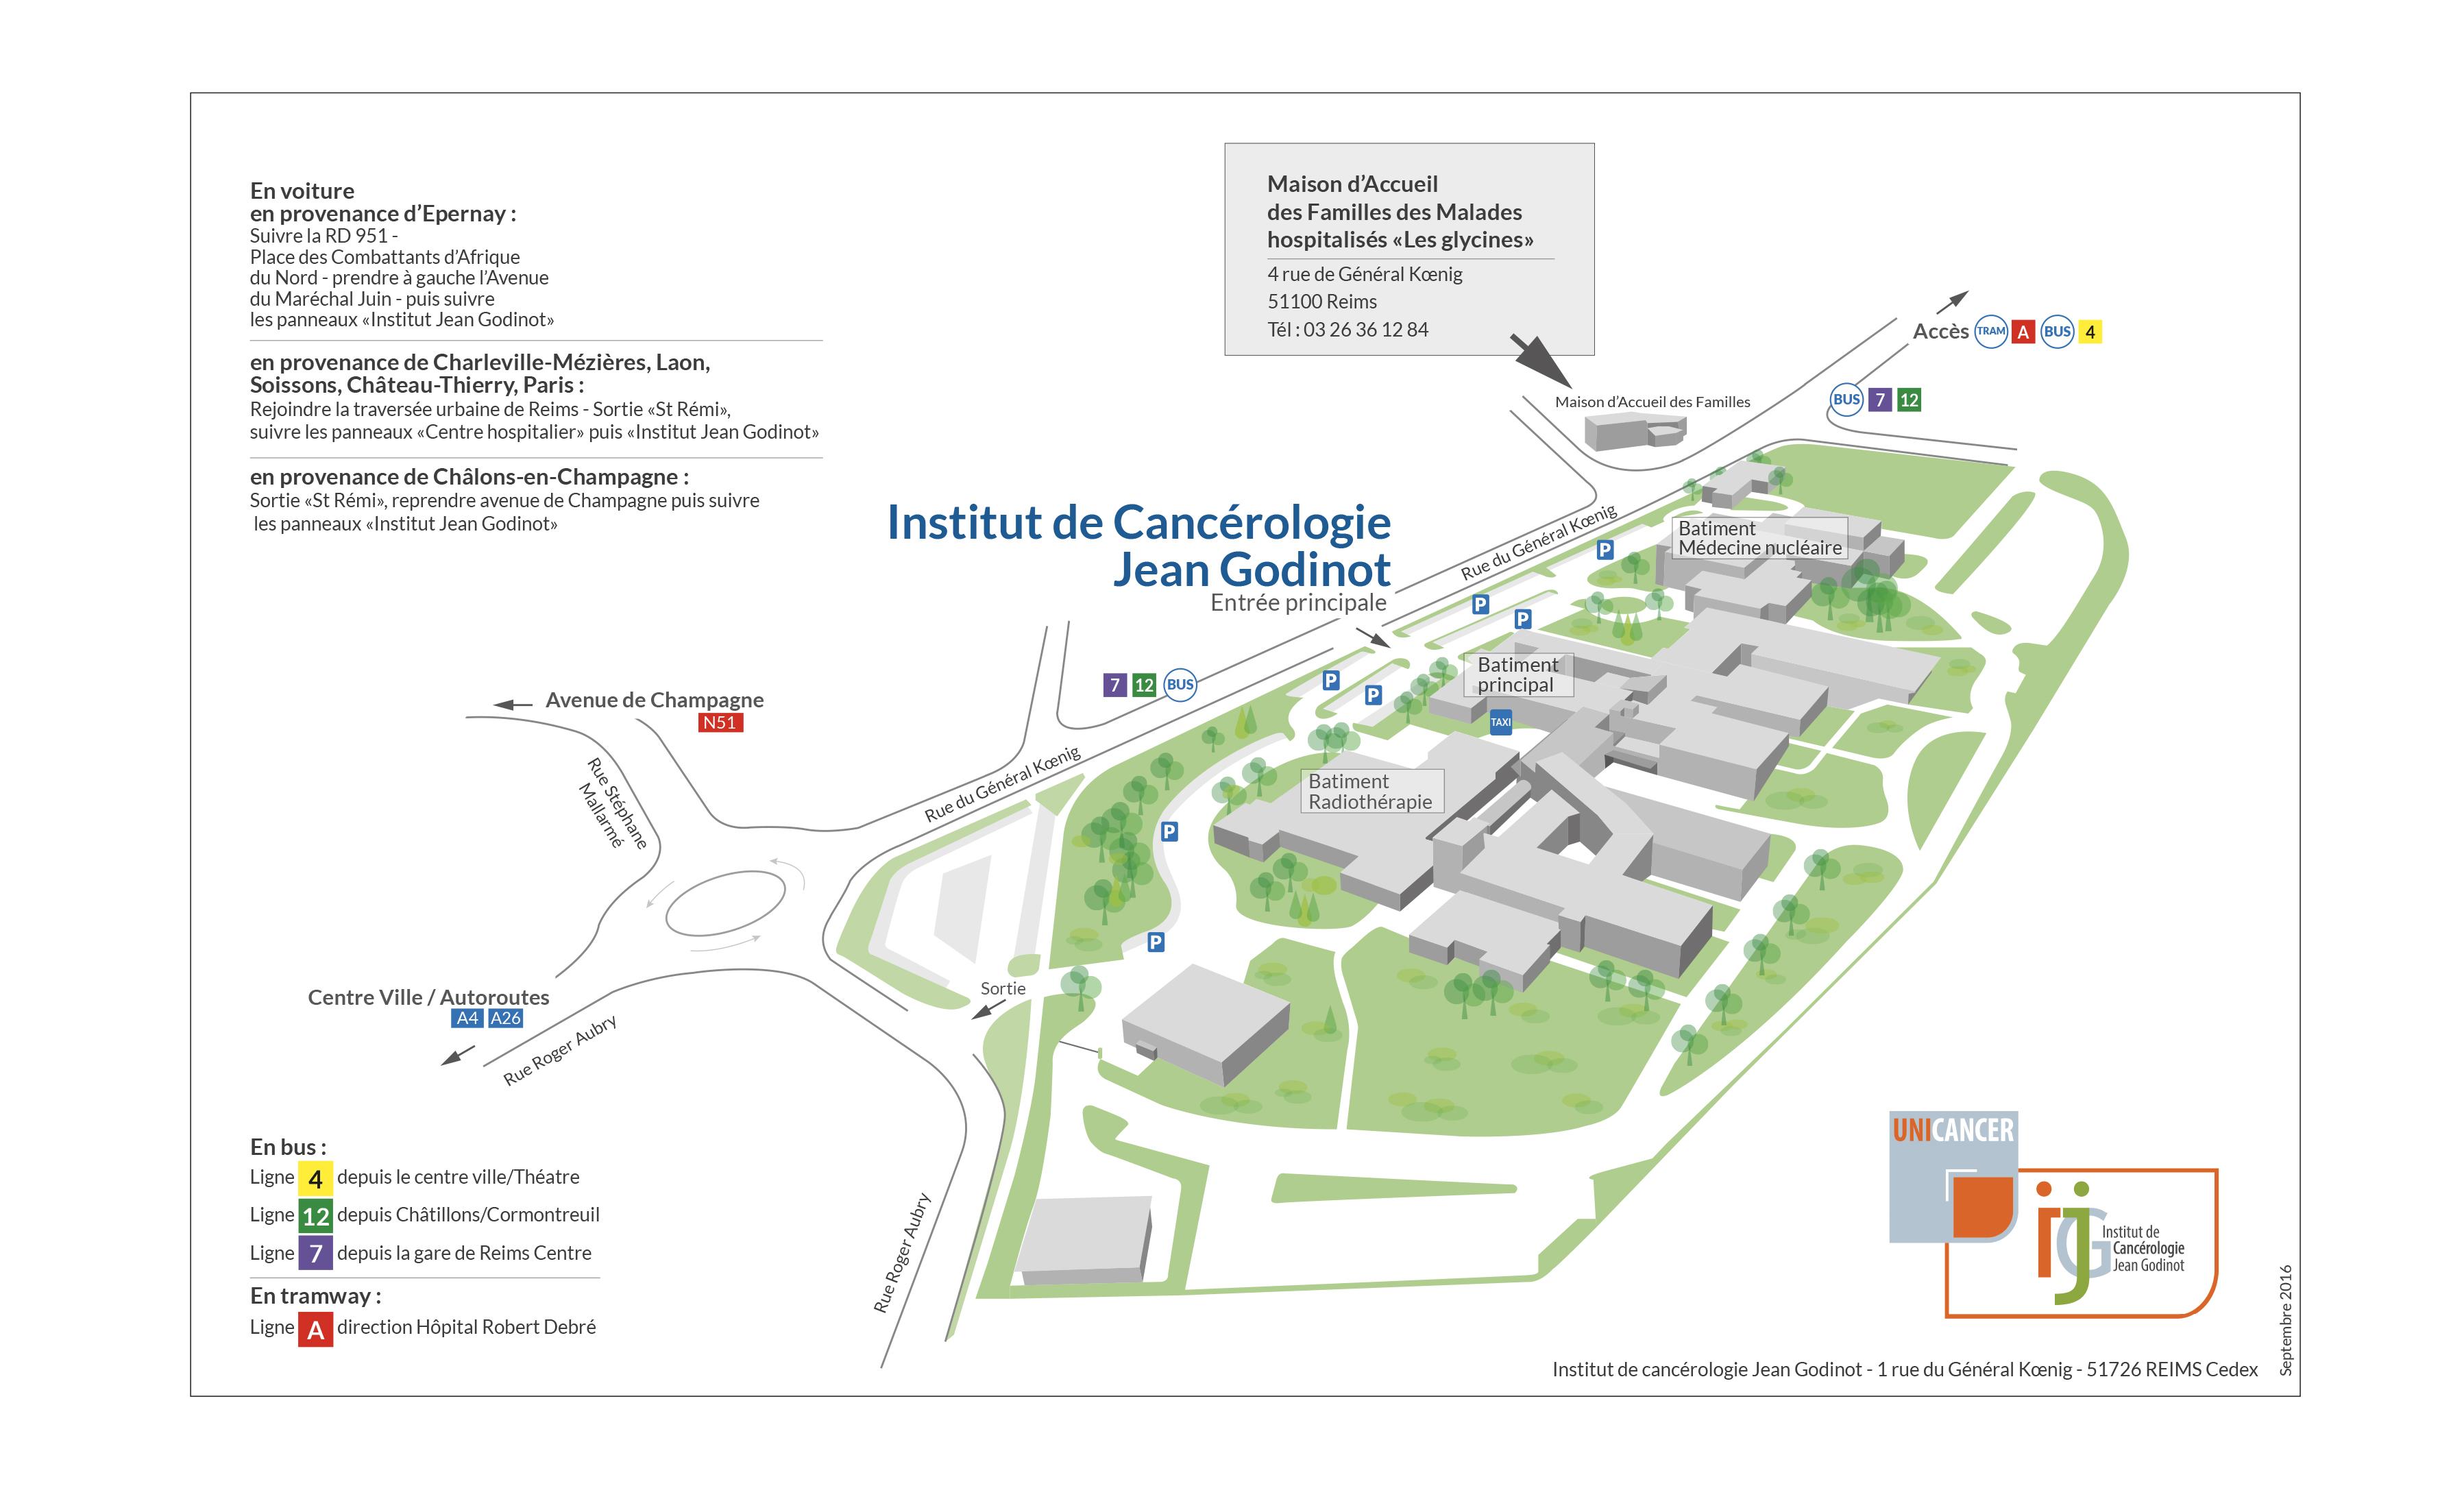 Institut De Canc 233 Rologie Jean Godinot